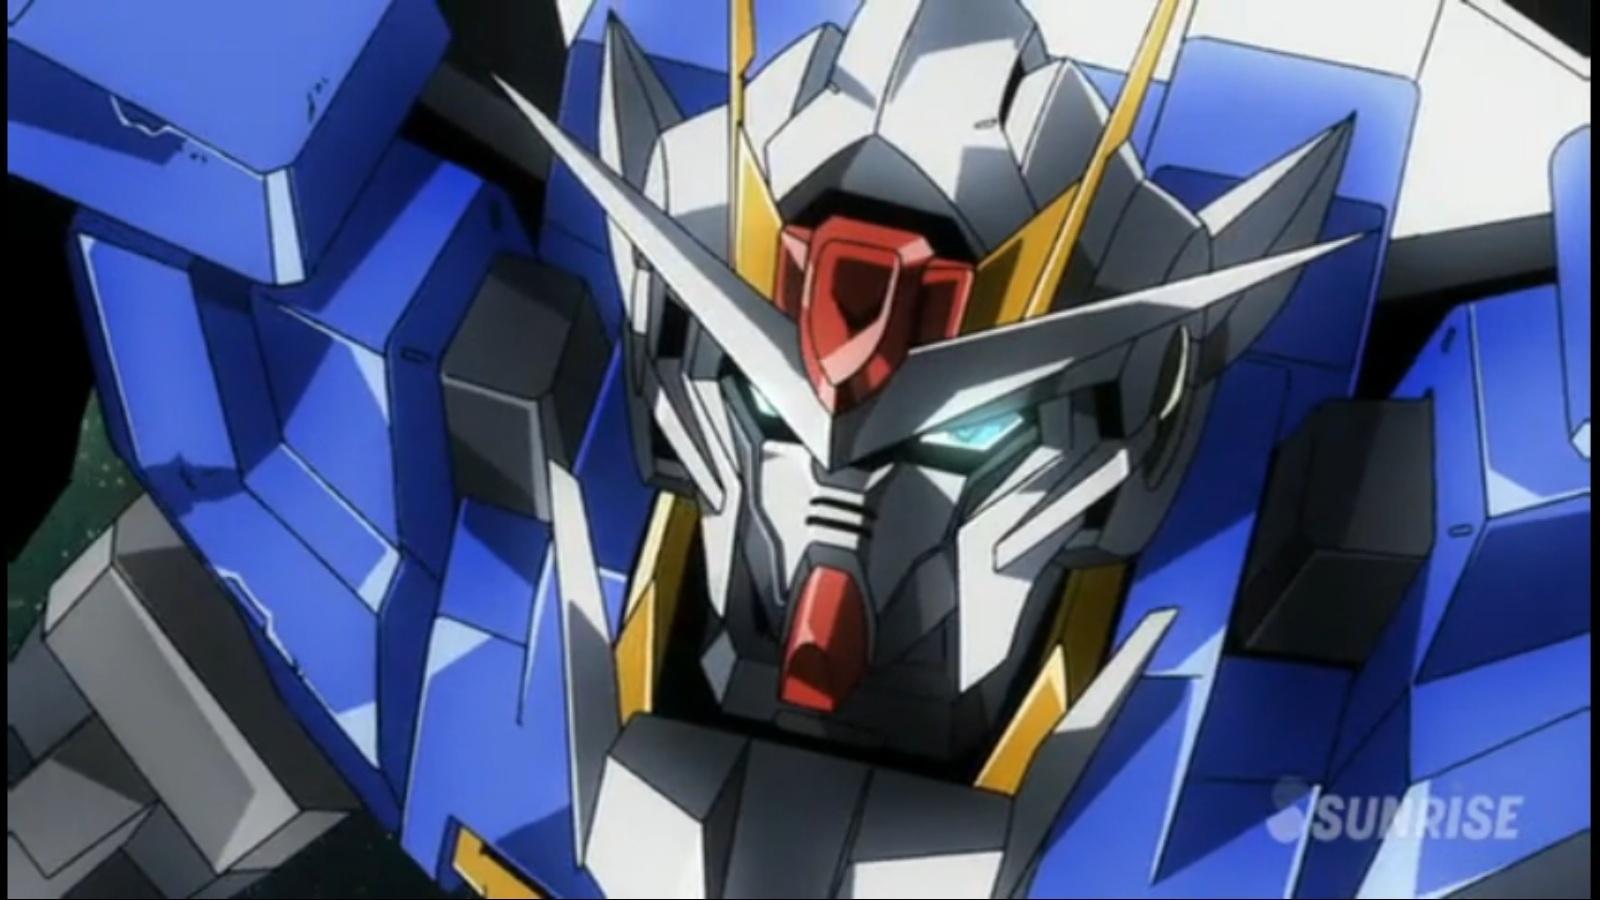 mobile suit gundam 00 images Gundam 00 HD wallpaper and ...